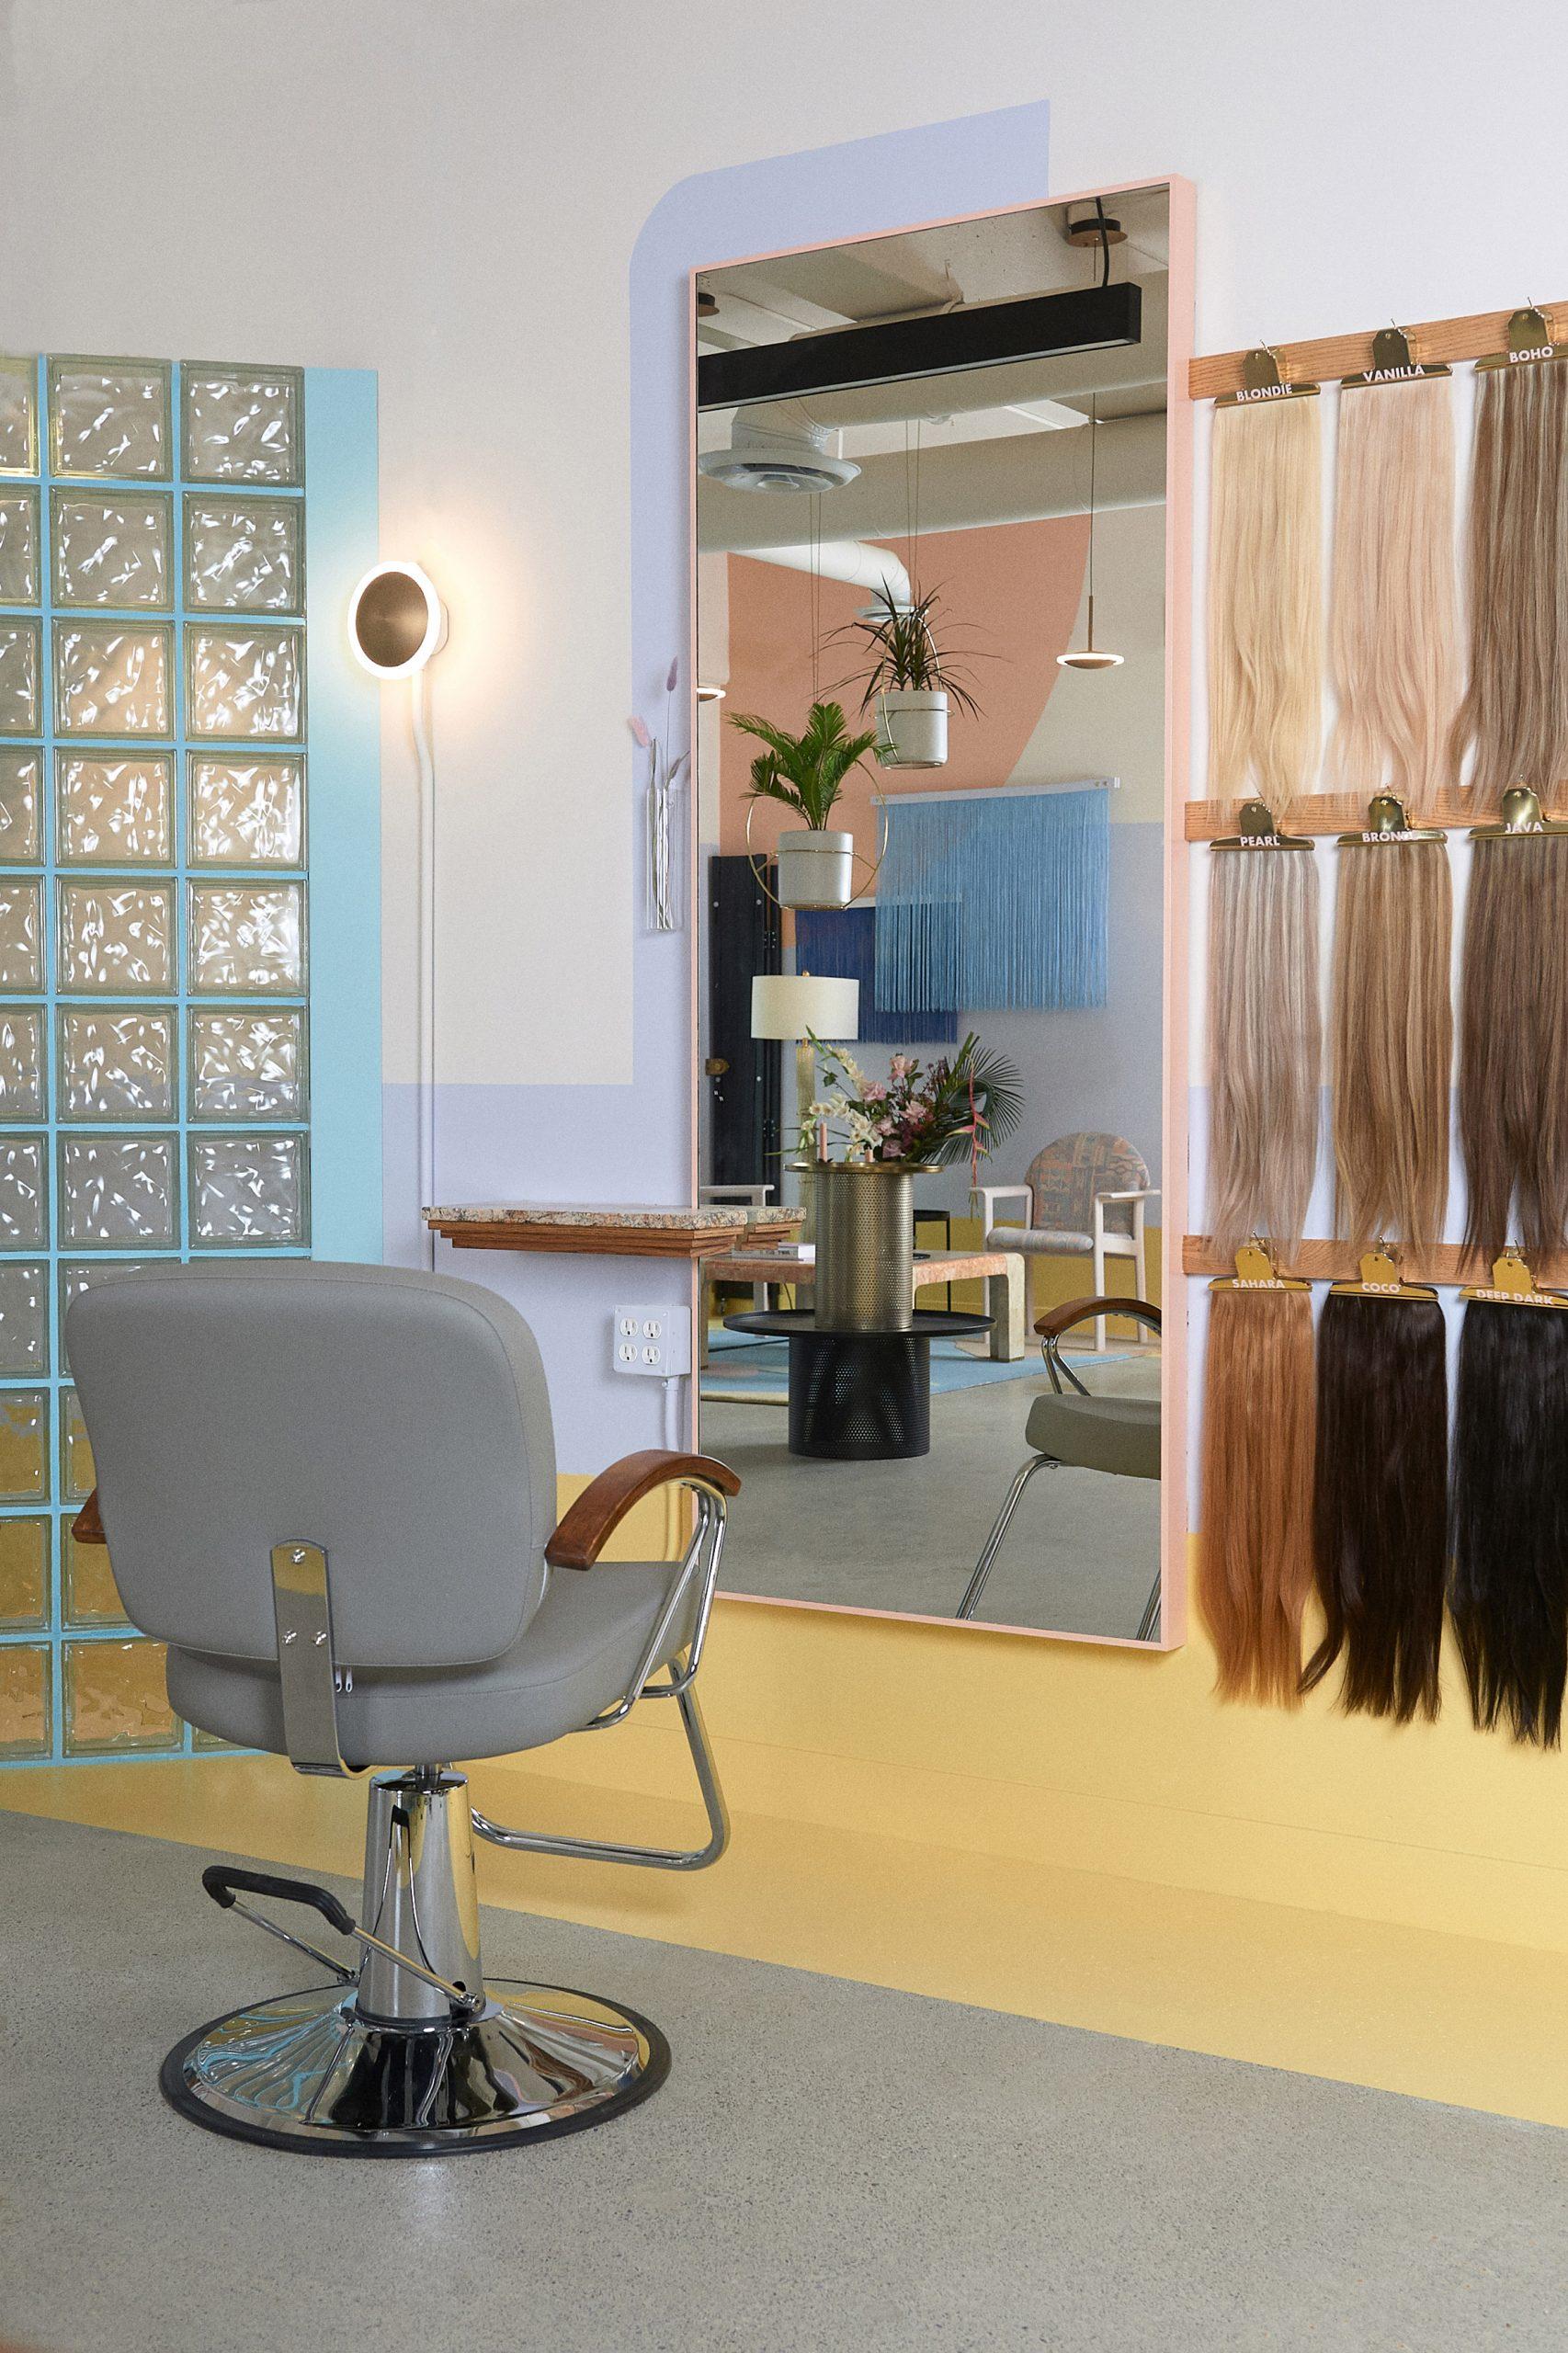 Qali hair salon by Studio Roslyn